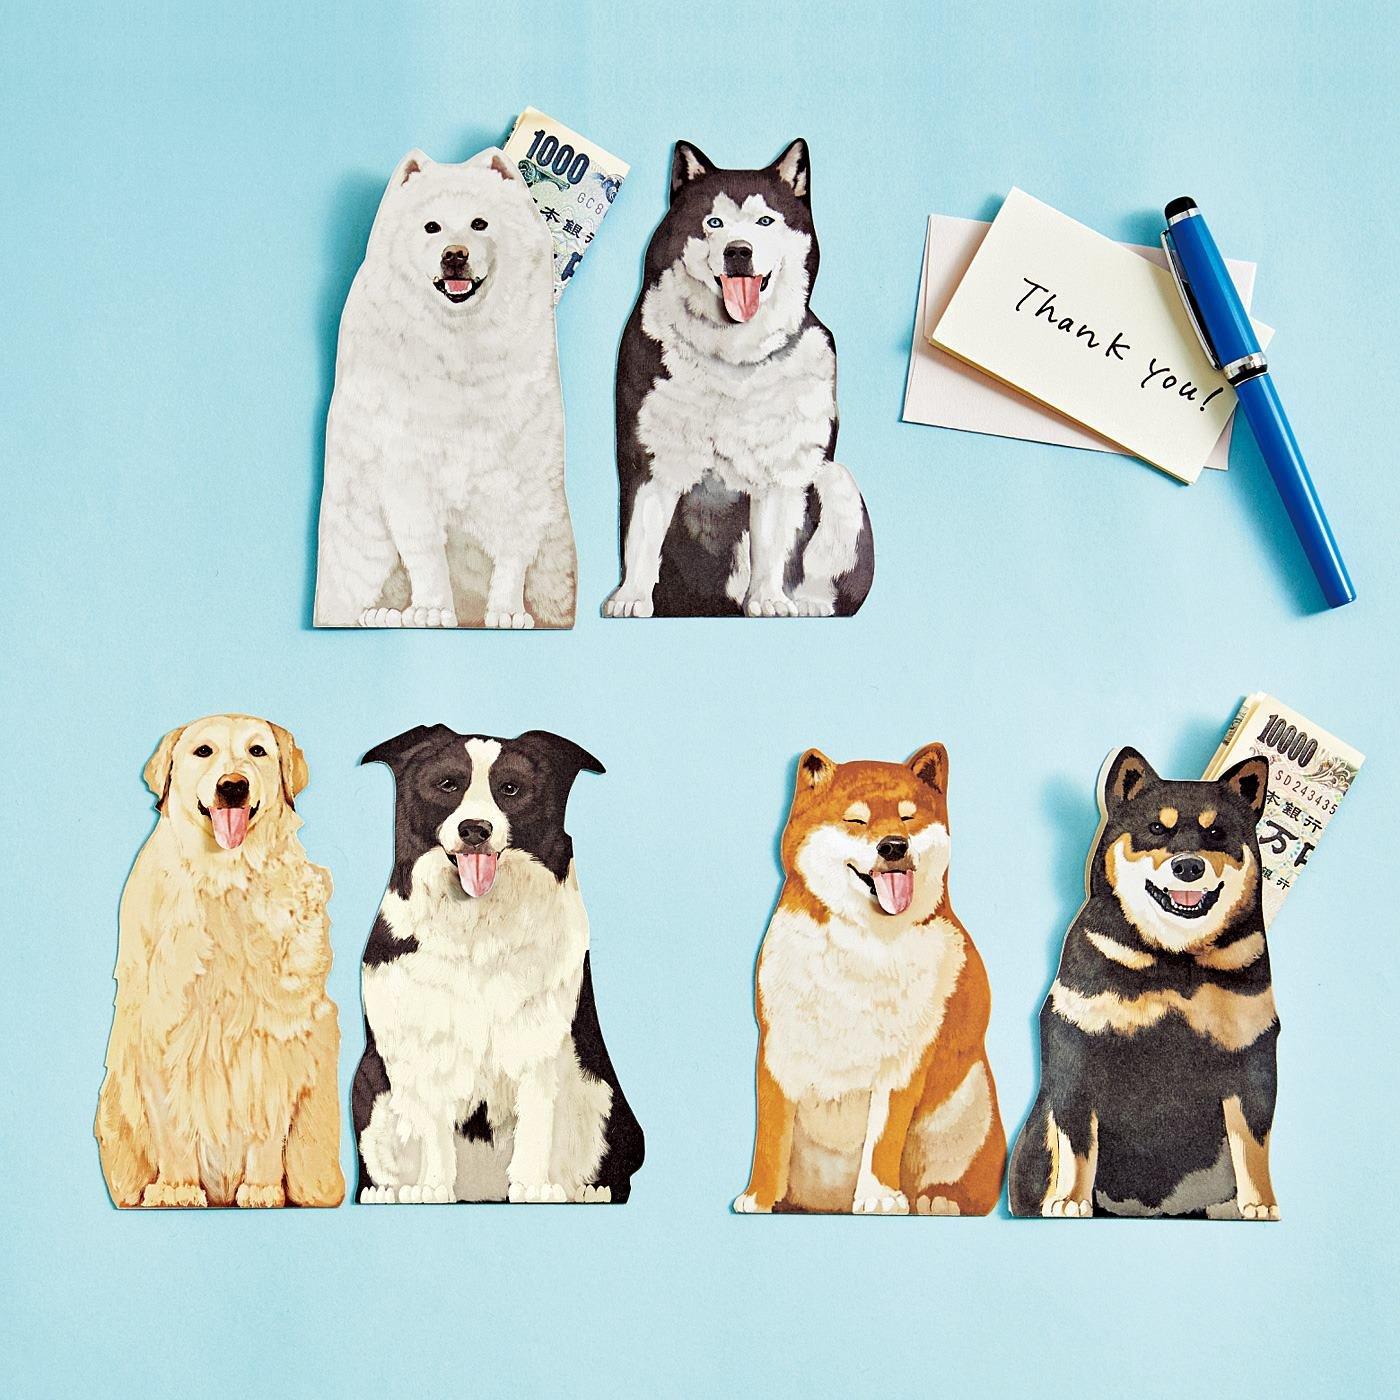 YOU+MORE! お札を入れたらペロリと閉じる 犬のヘッヘッヘポチ袋の会